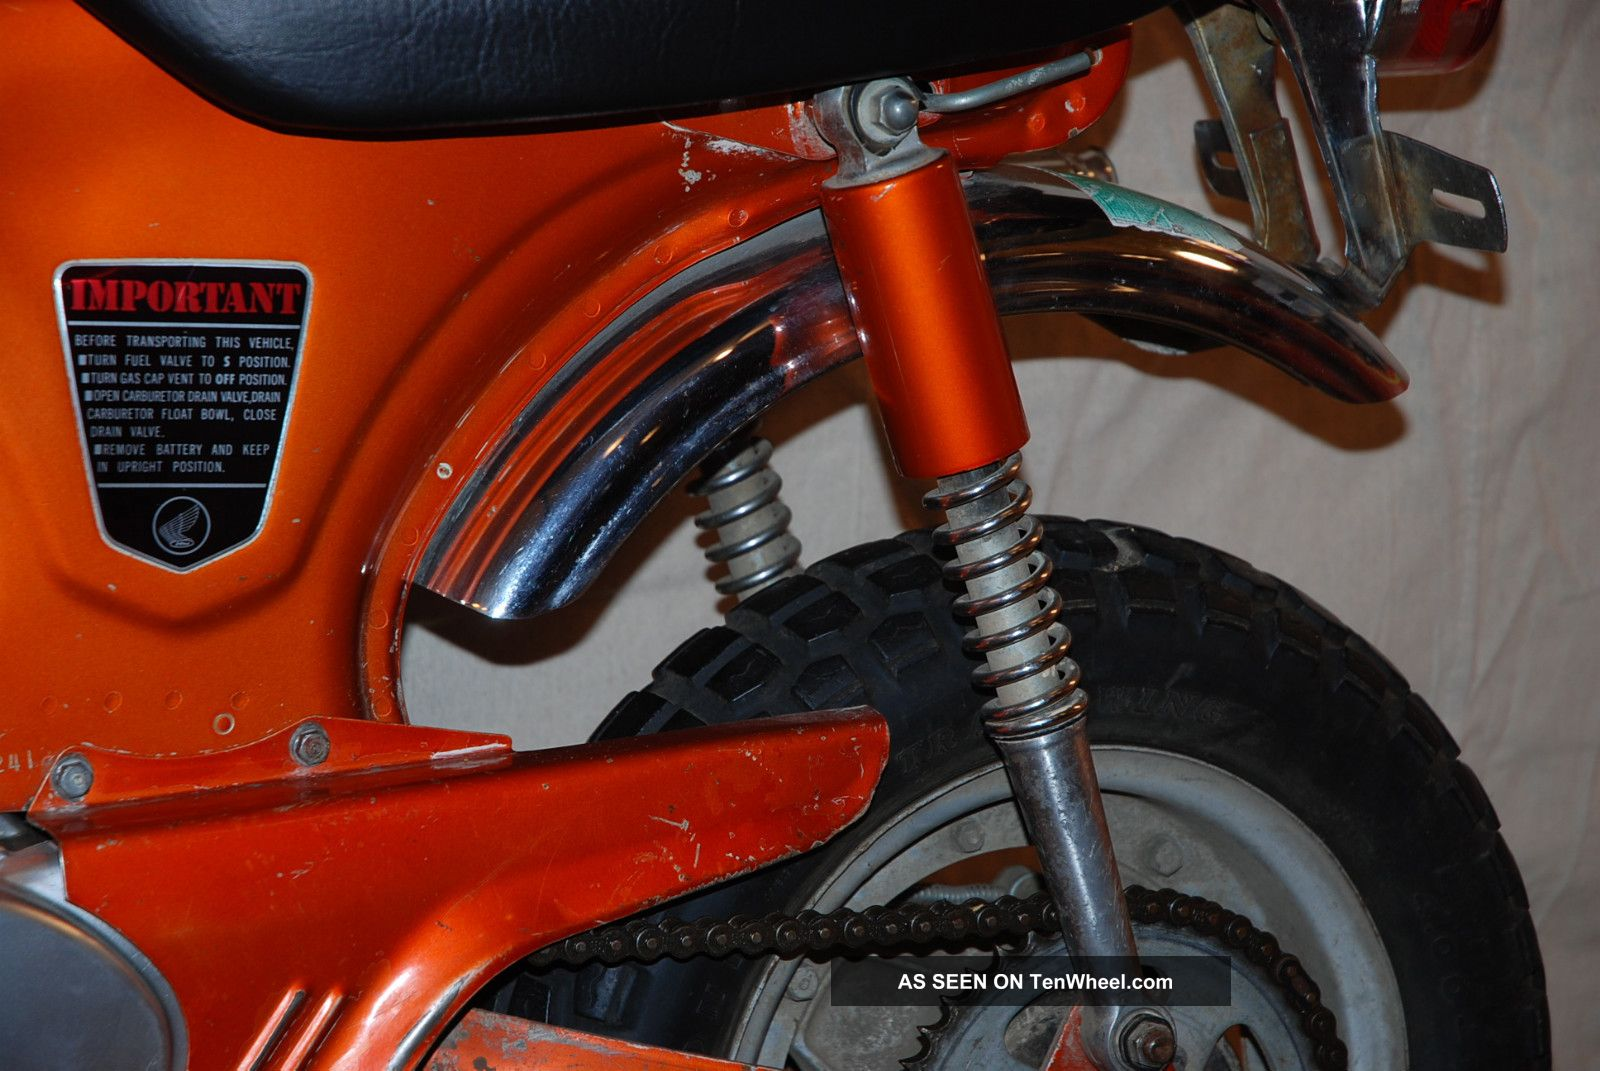 1970 Honda Ct70h Topaz Orange 4 Speed Unrestored Private Ct70 Battery Collection